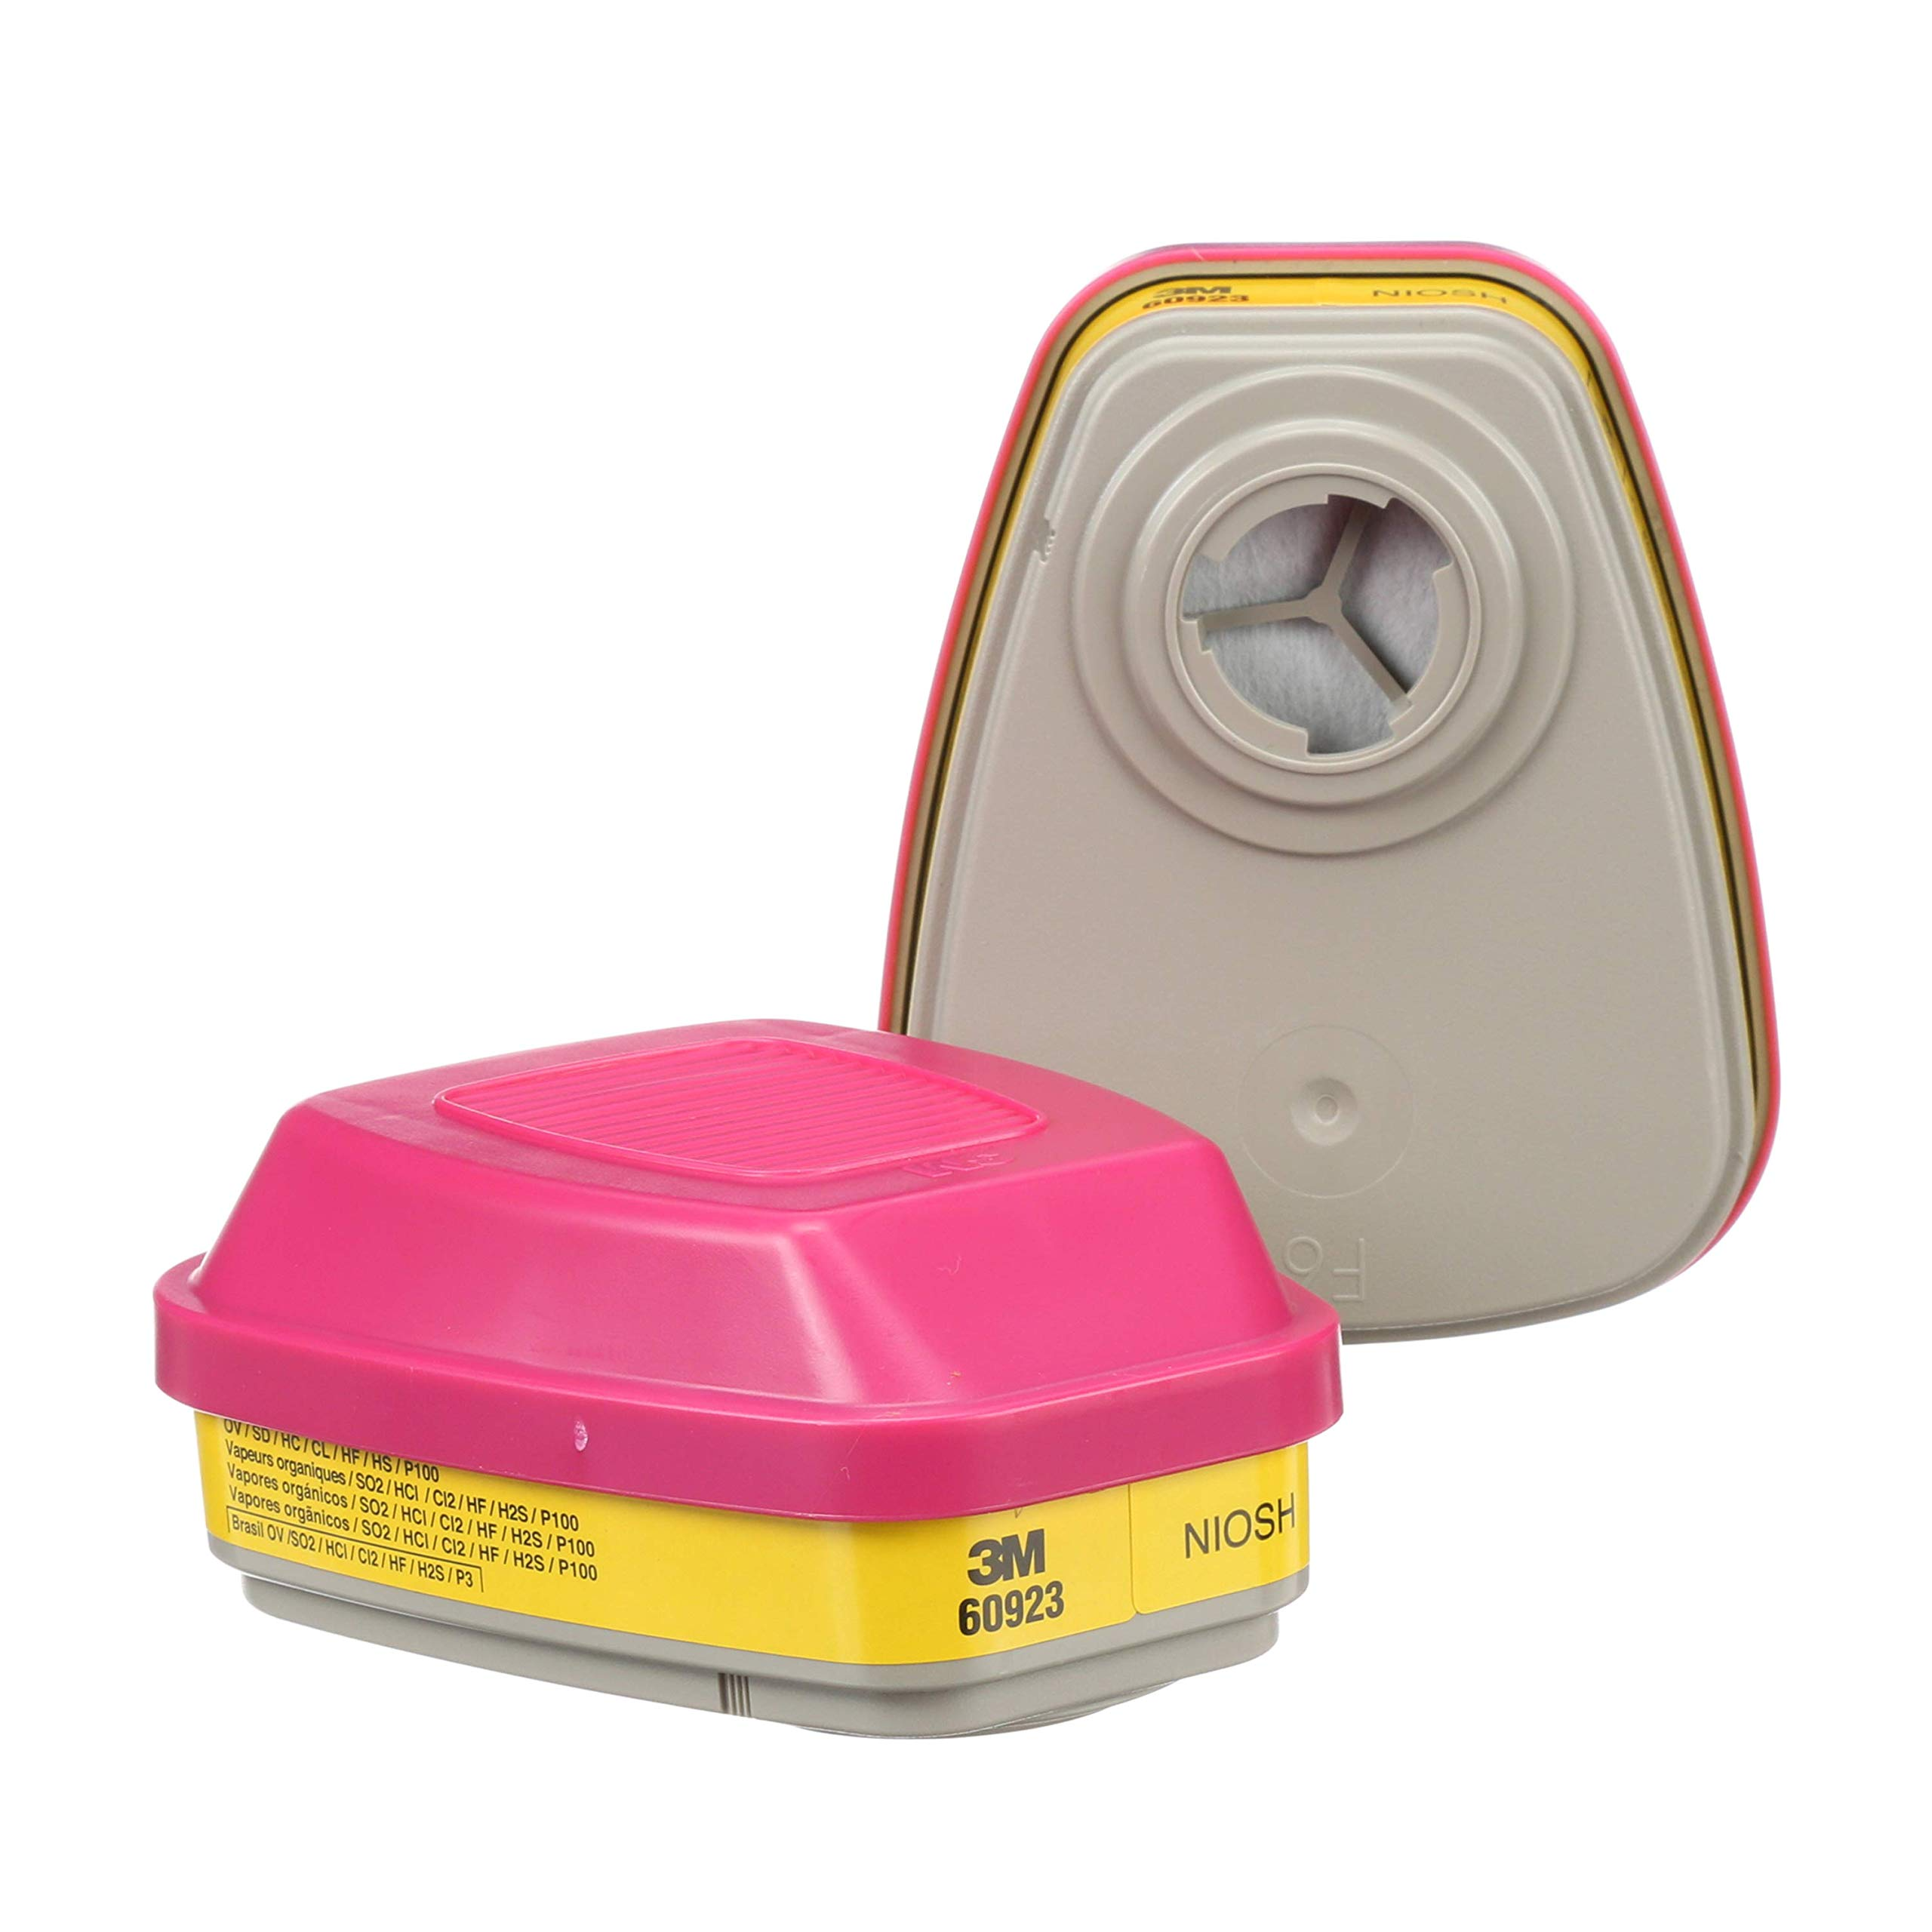 3M Organic Vapor/Acid Gas Cartridge/Filter 60923, P100 Respiratory Protection (Pack of 2)